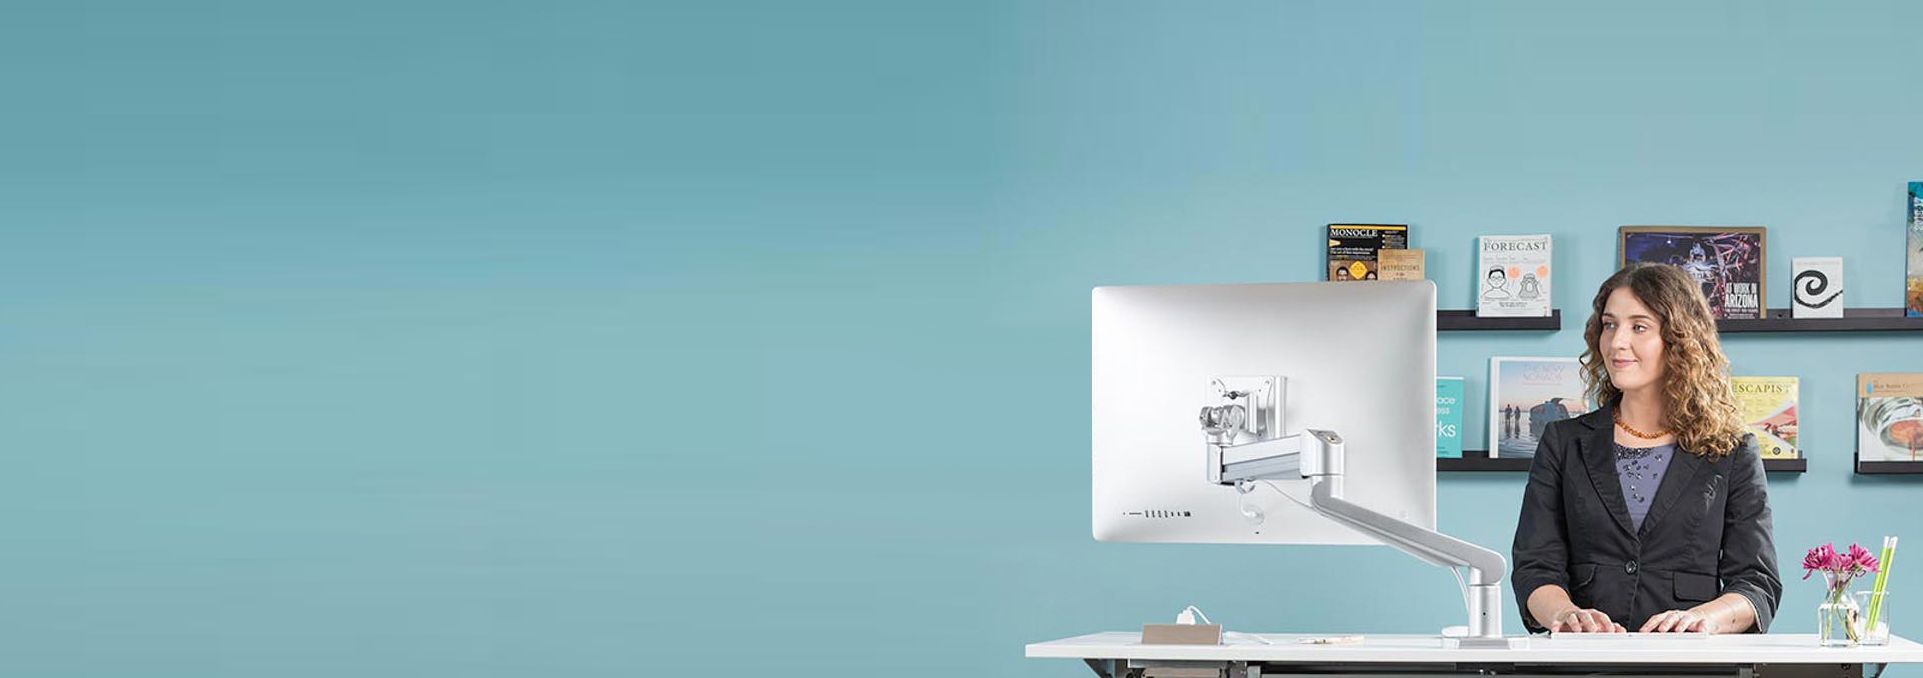 Hosted Desktop-as-a-Service